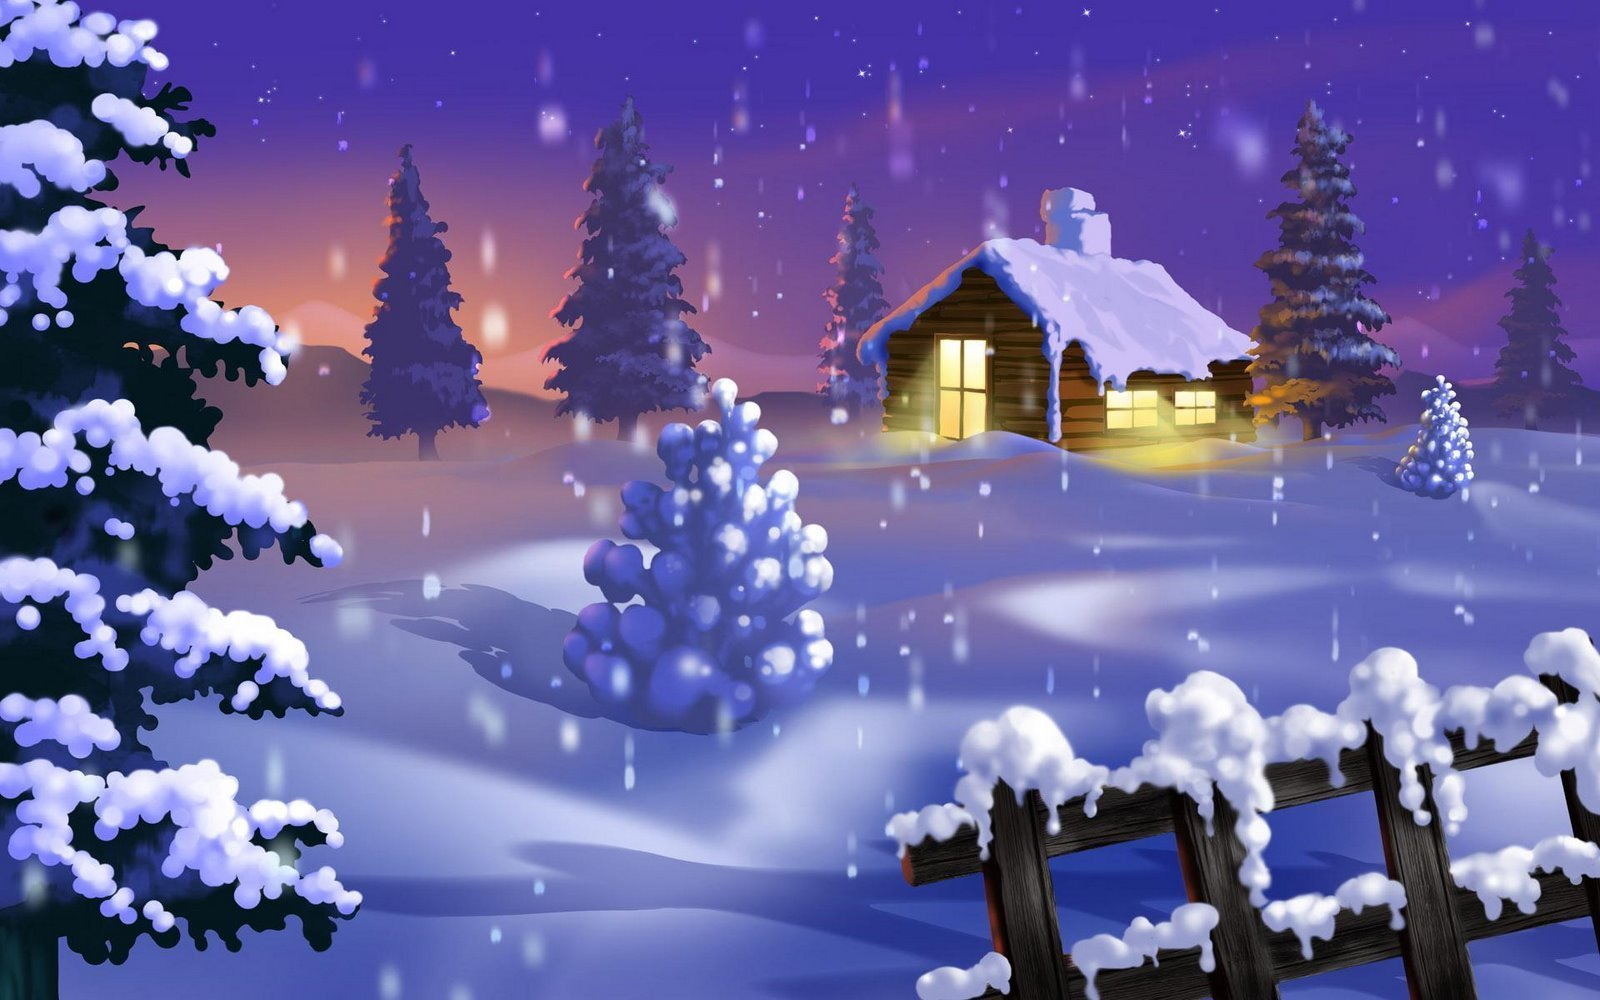 Christmas HQ wallpapers   Christmas Wallpaper 2768066 1600x1000